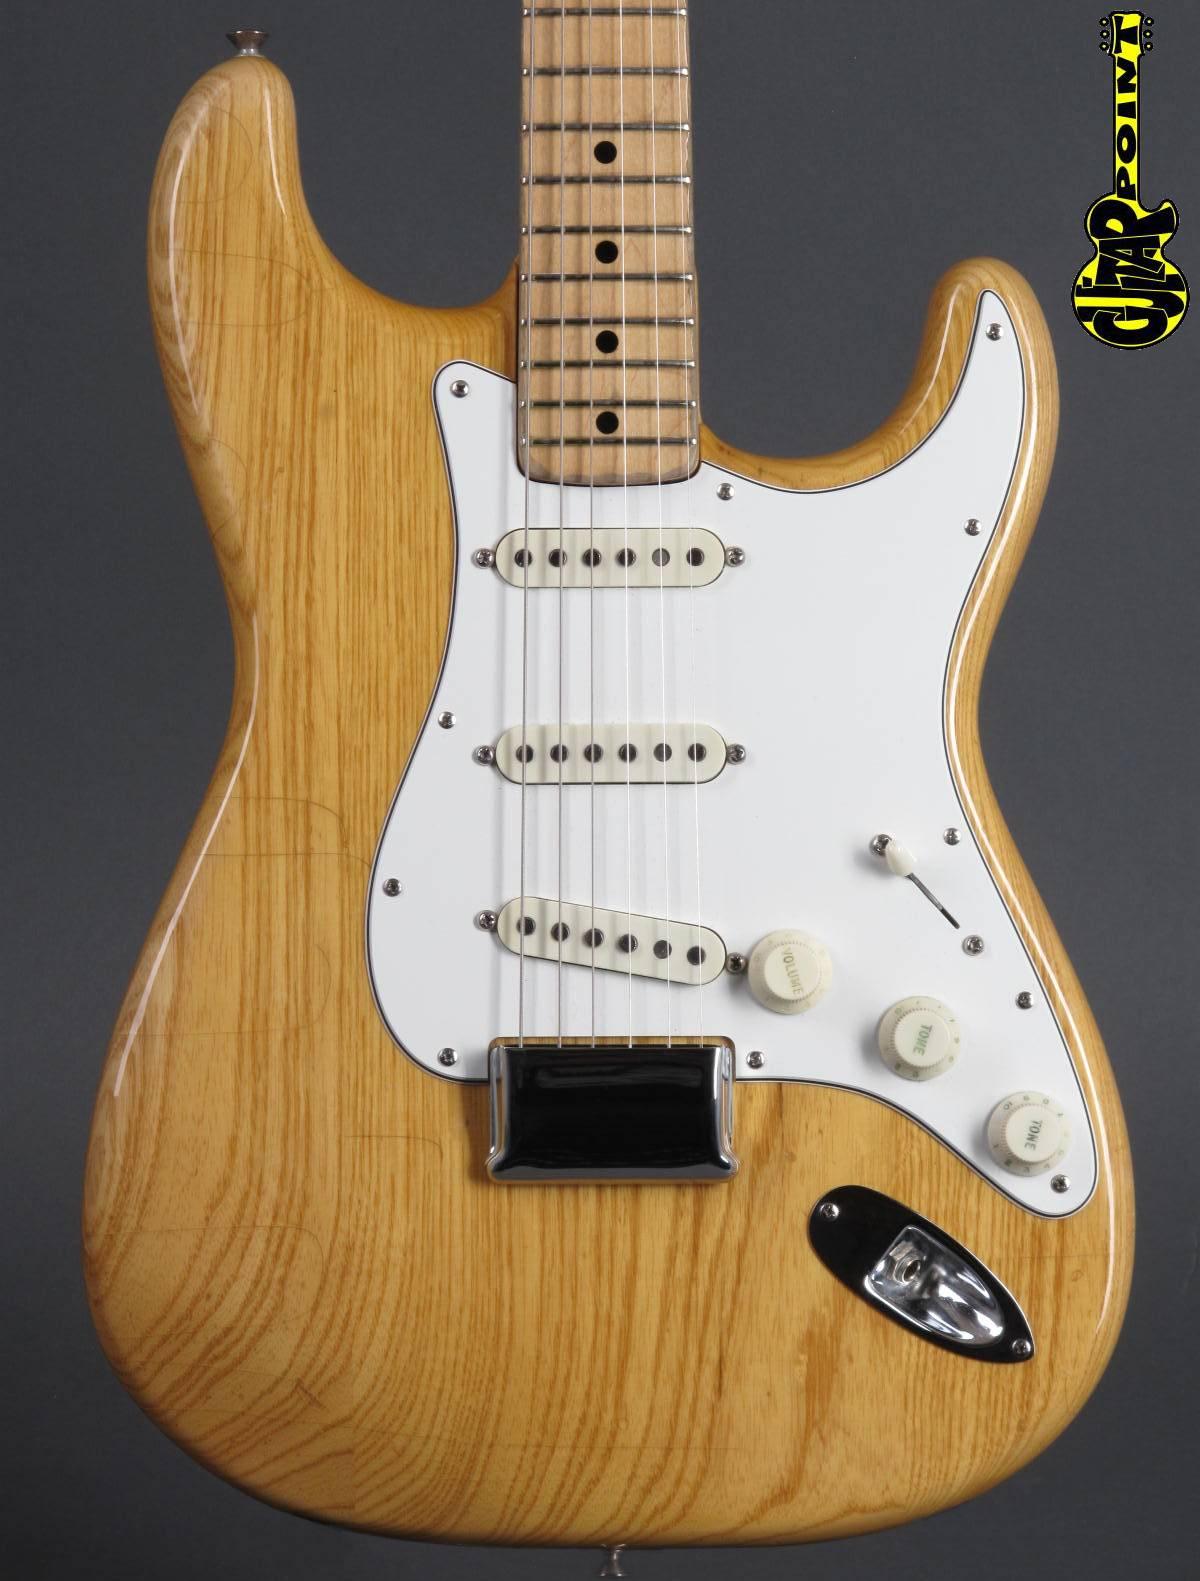 1974 Fender Stratocaster Hardtail - Natural